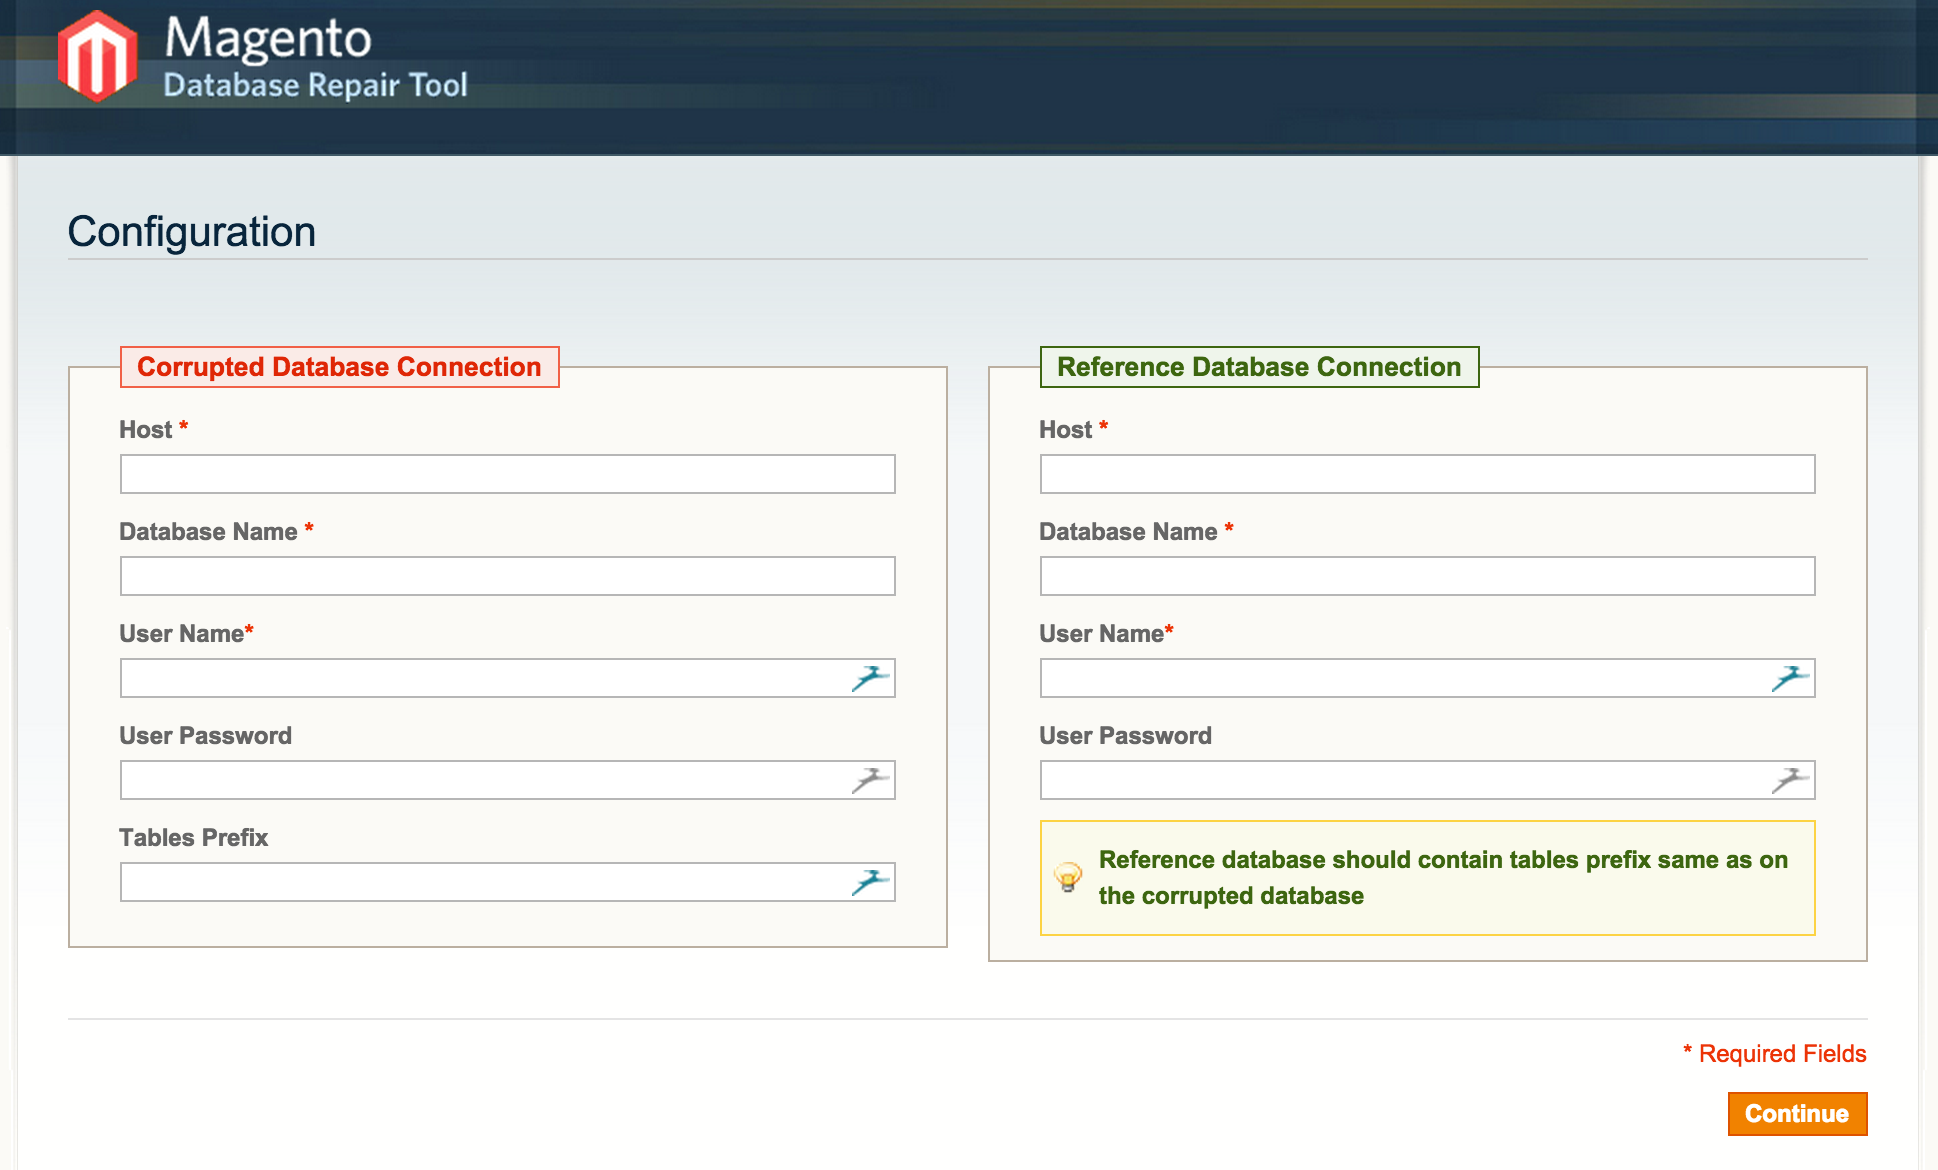 Magento Database Repair Tool